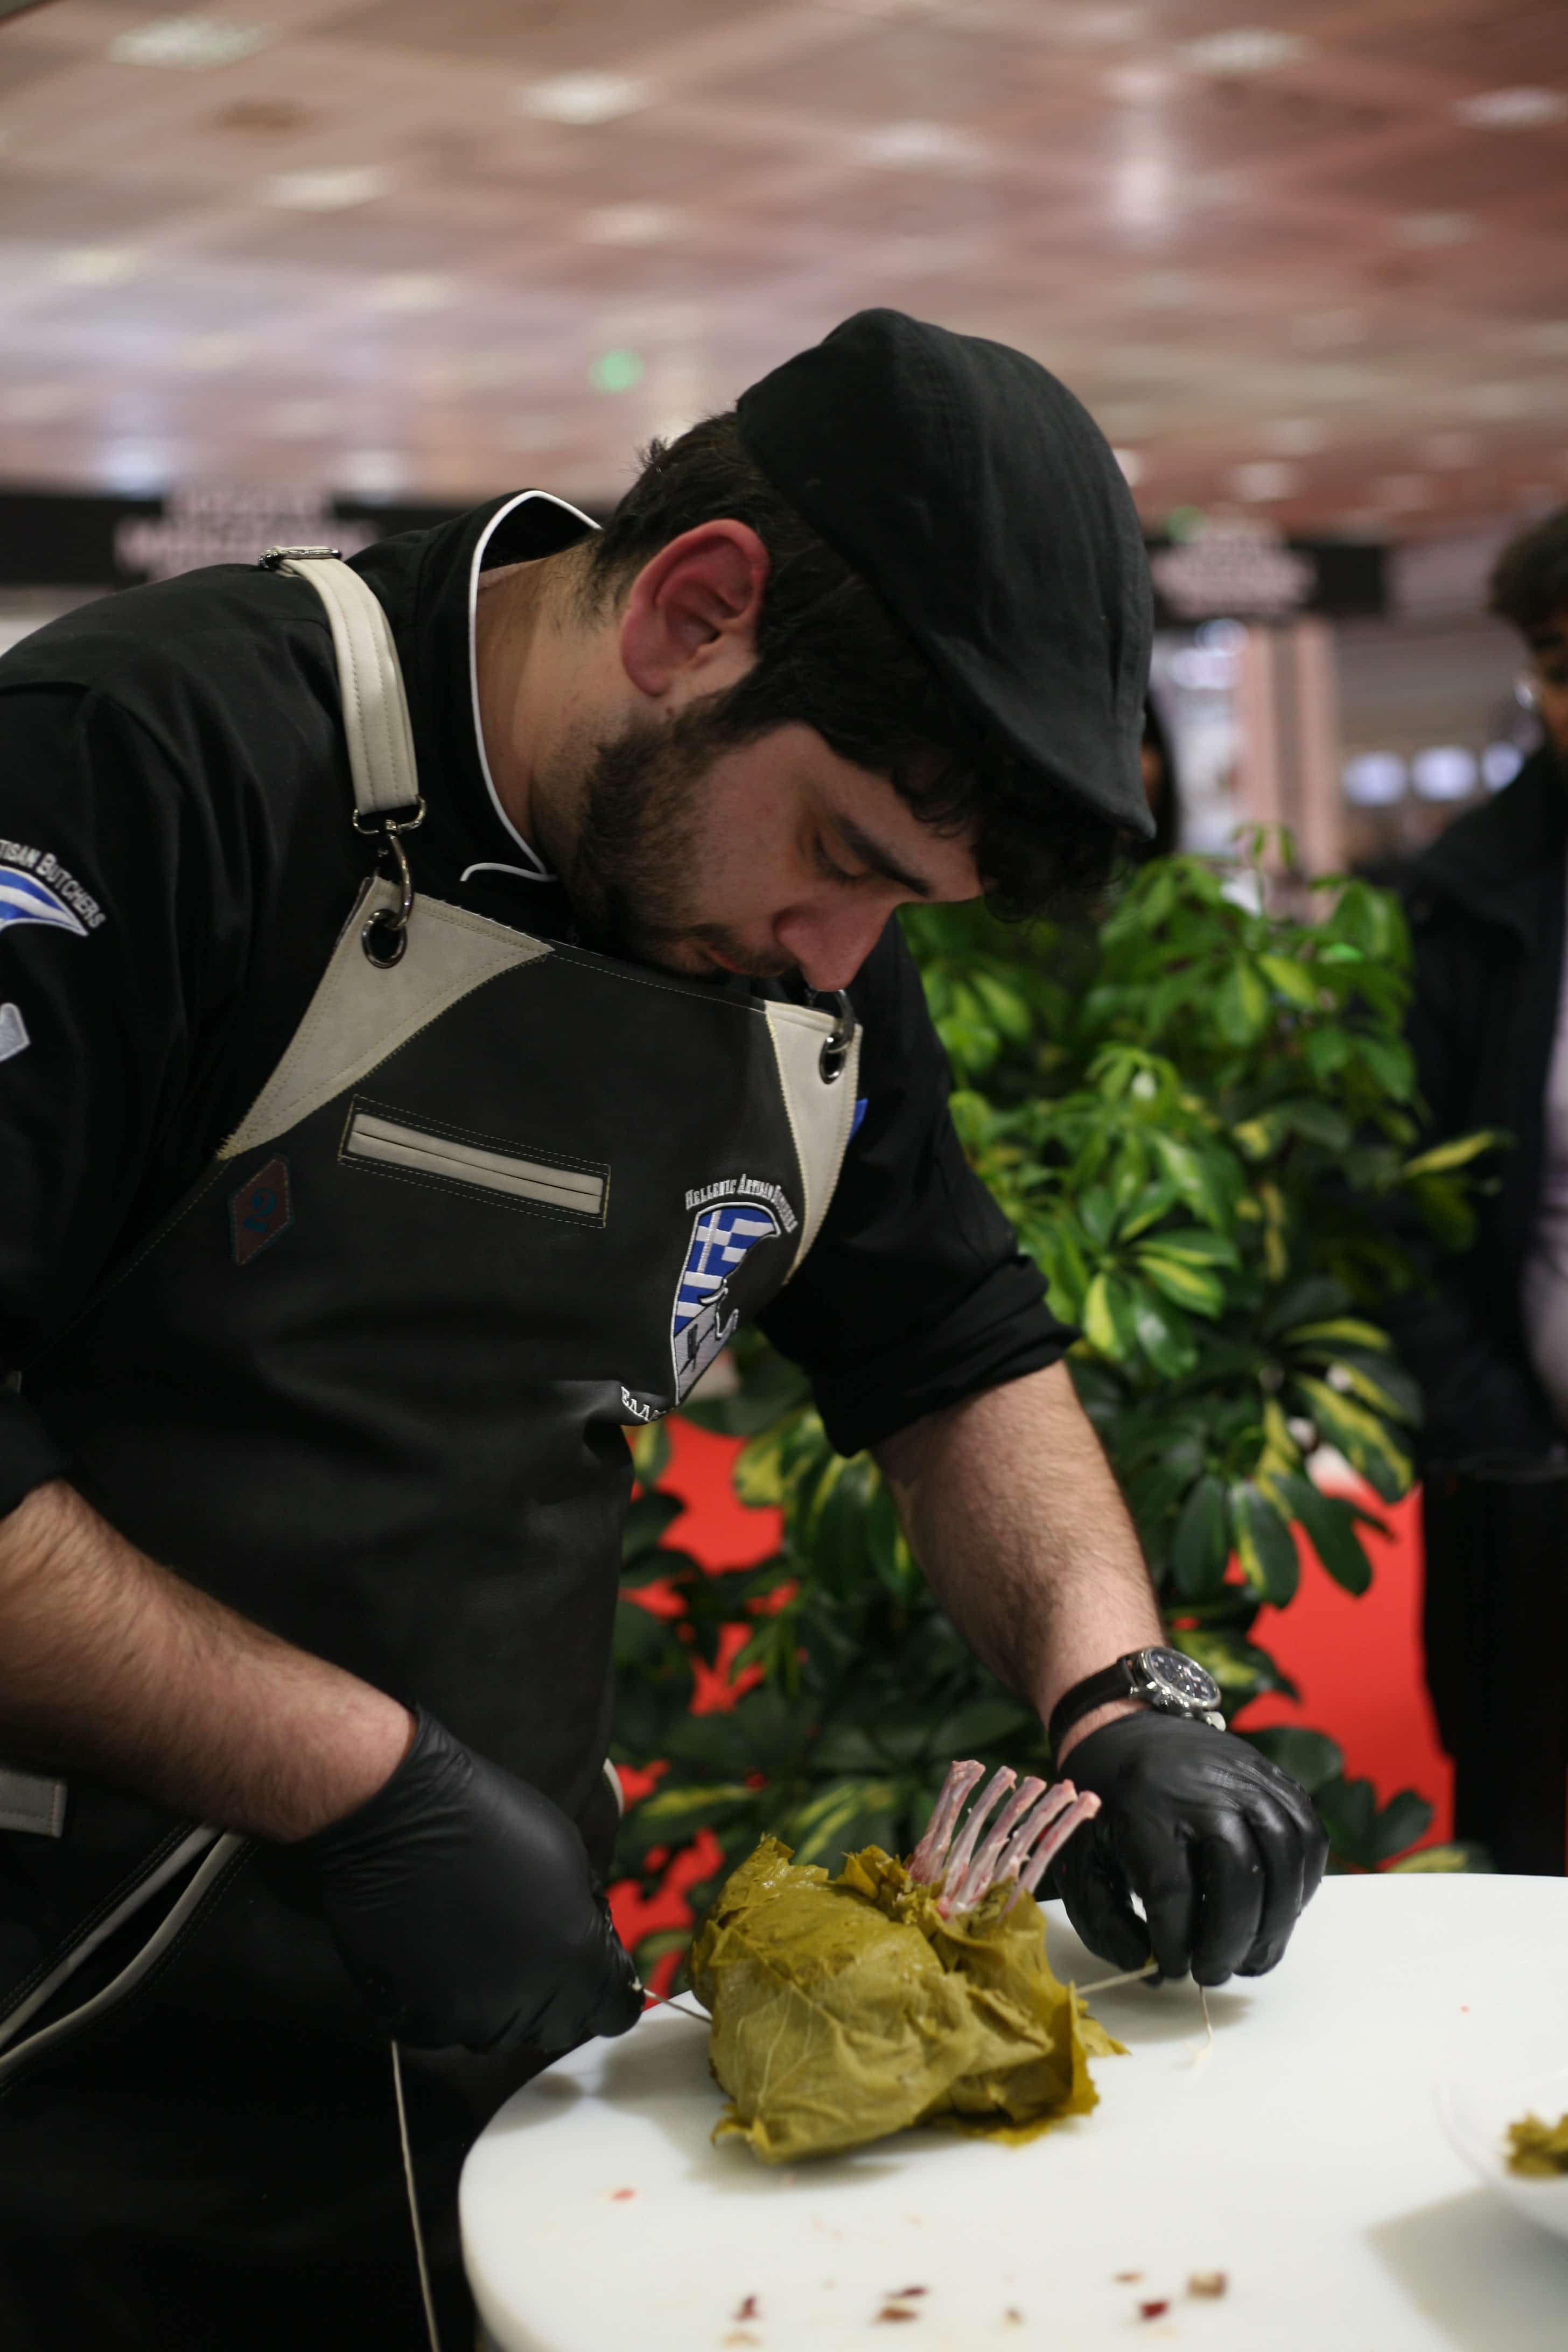 Giorgio's Artisan Butchering & more